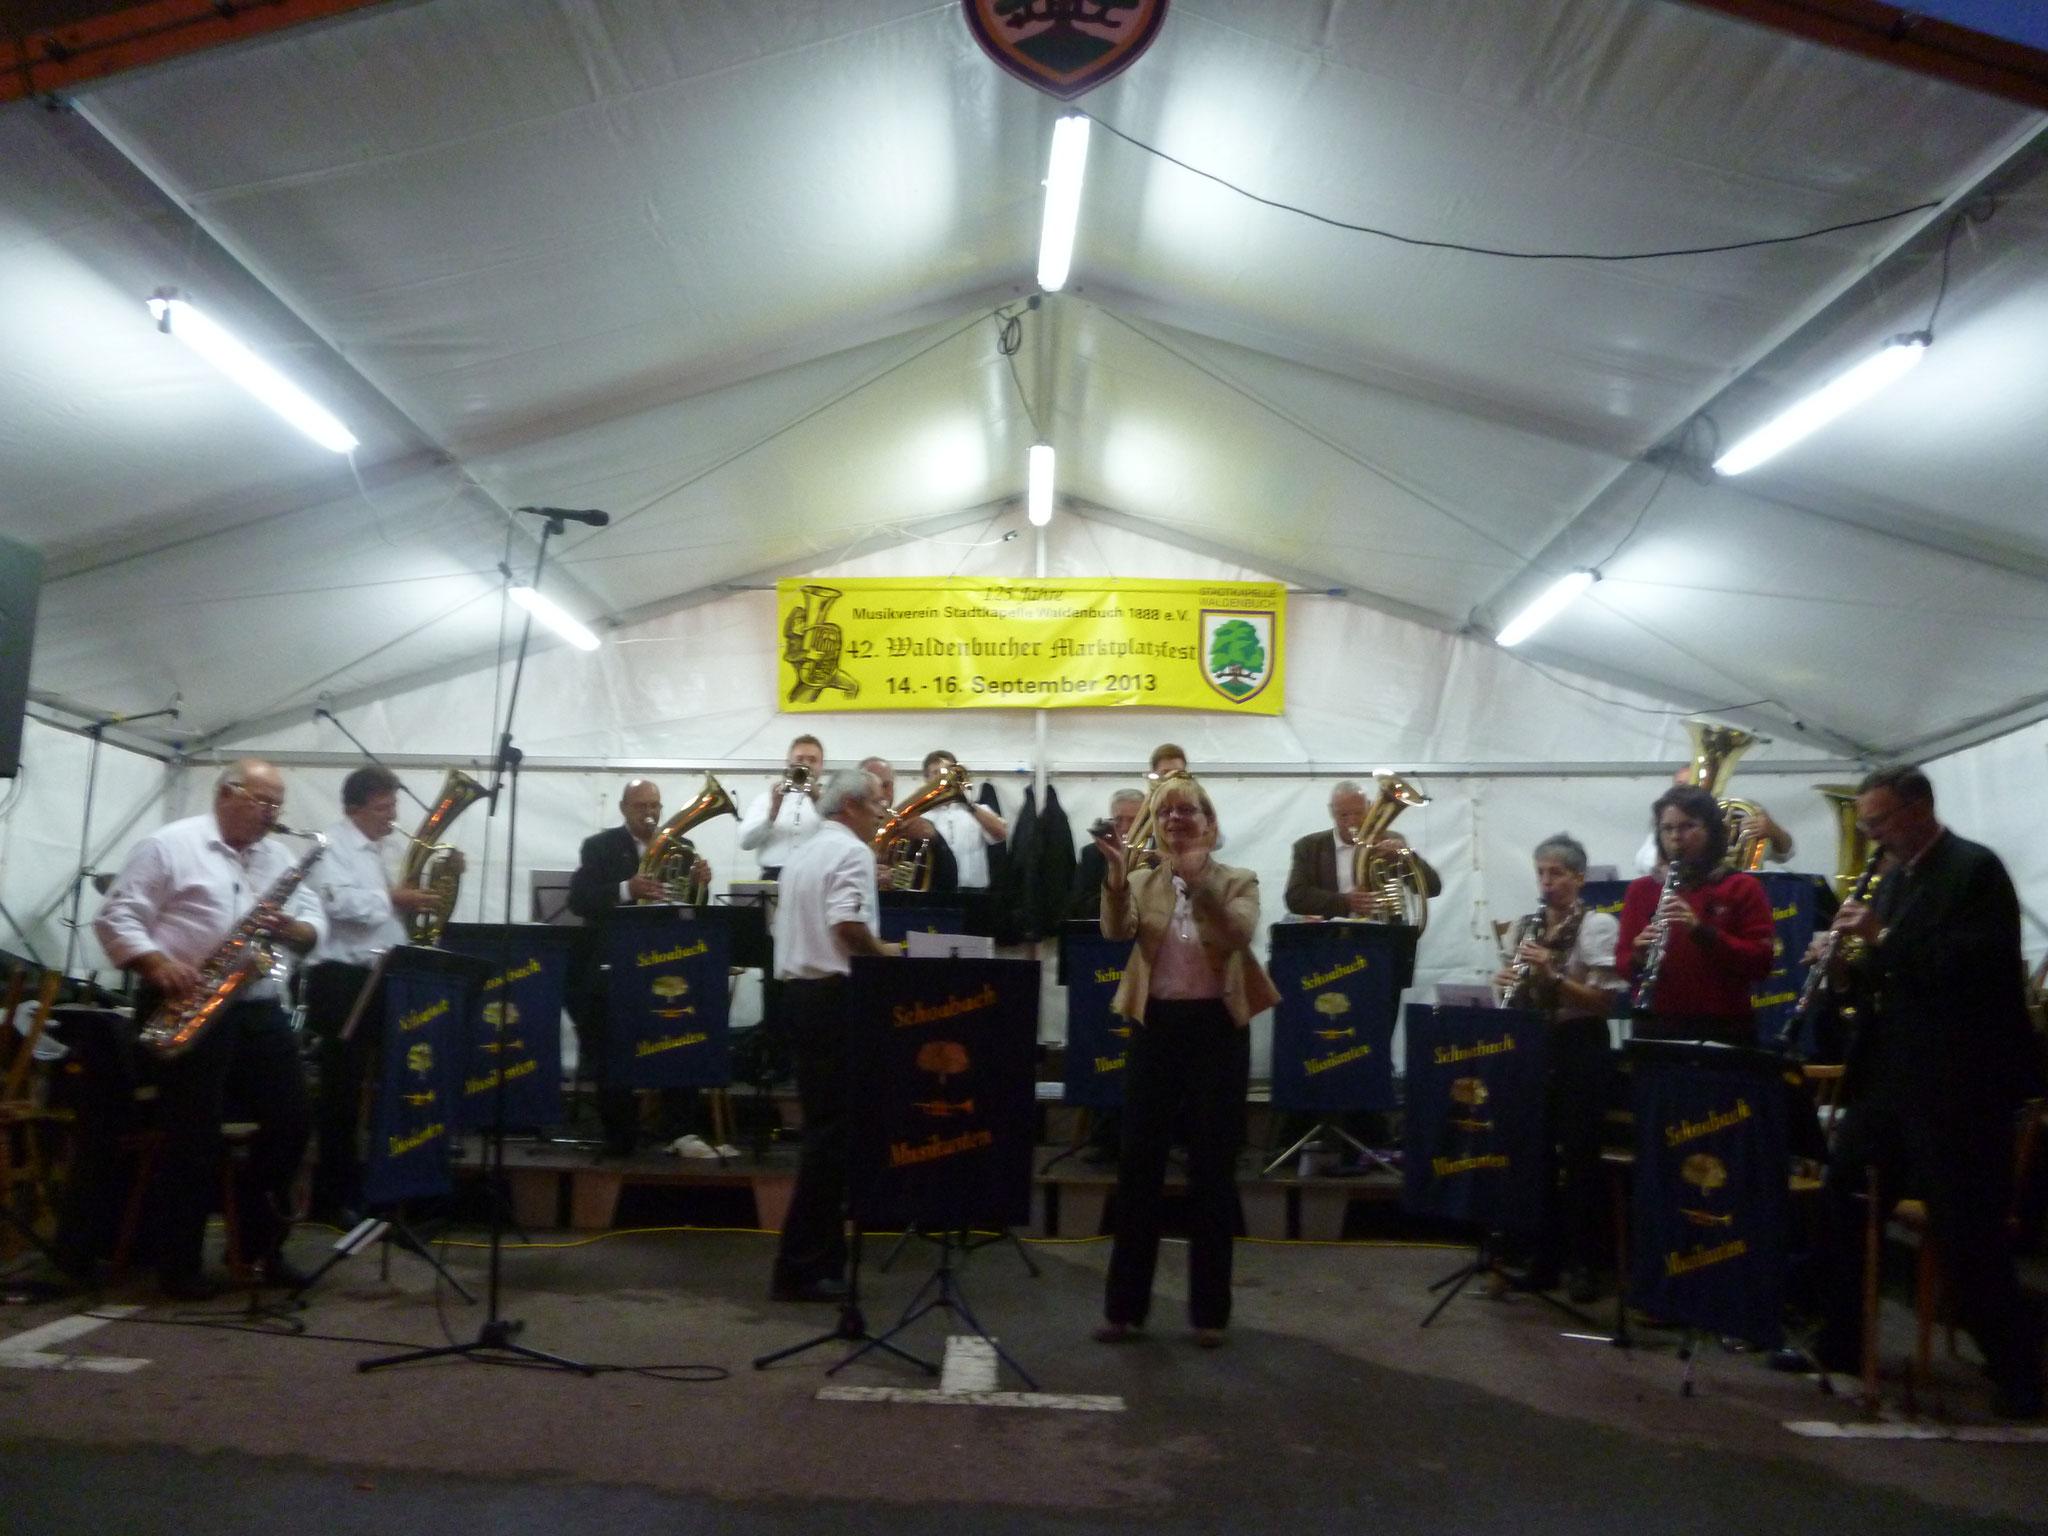 MV Waldenbuch Marktplatzfest 15.09.2013